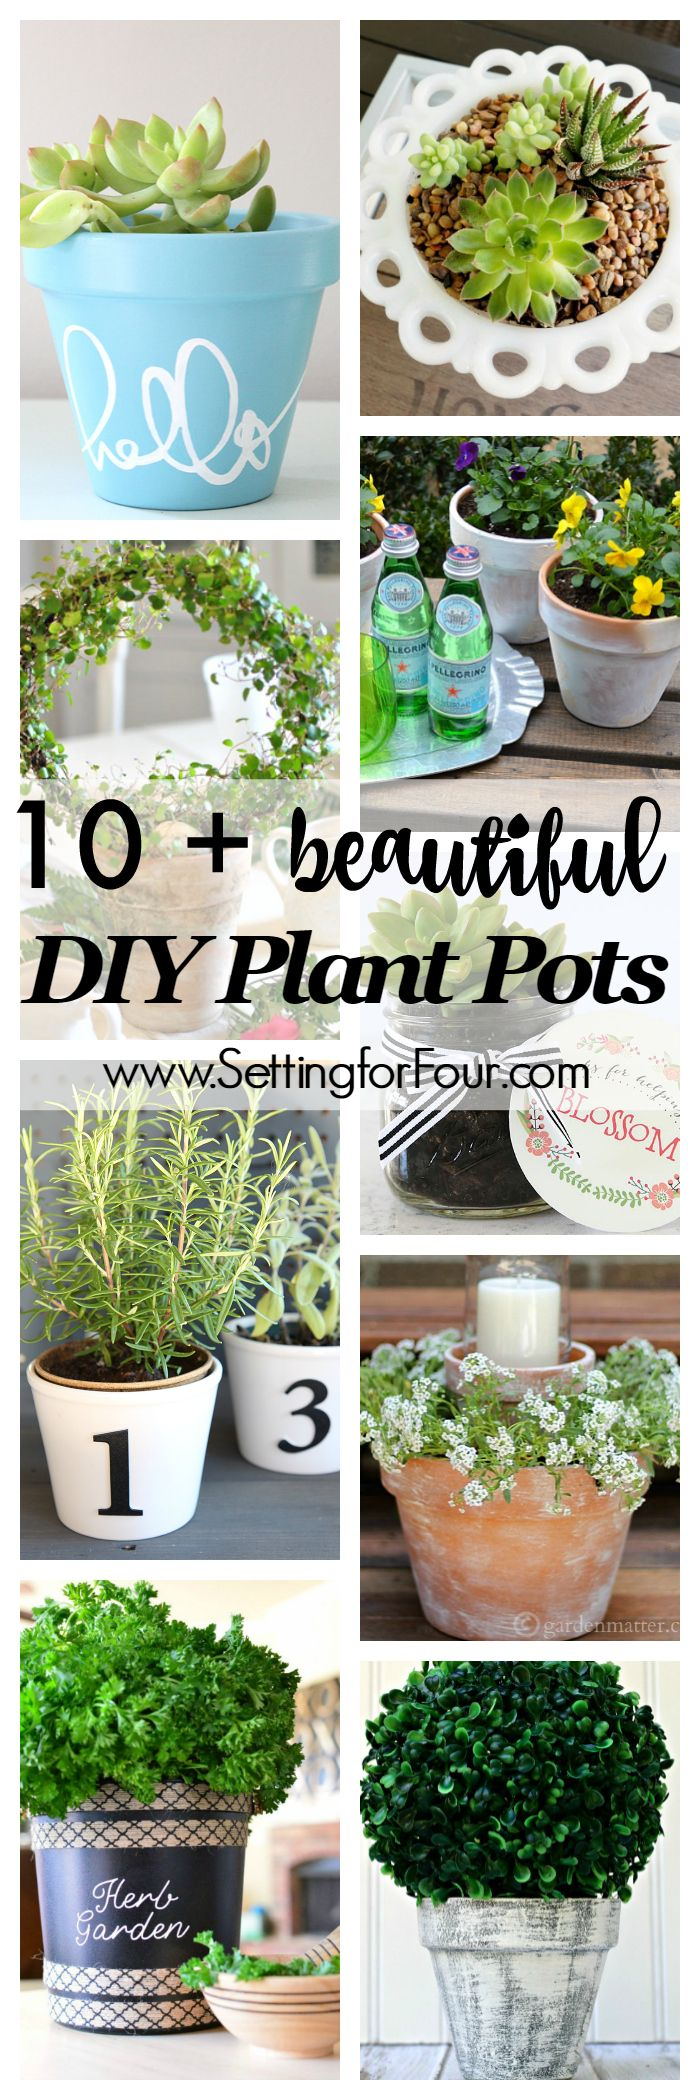 1000 Images About Diy Home Decor Ideas On Pinterest 400 x 300